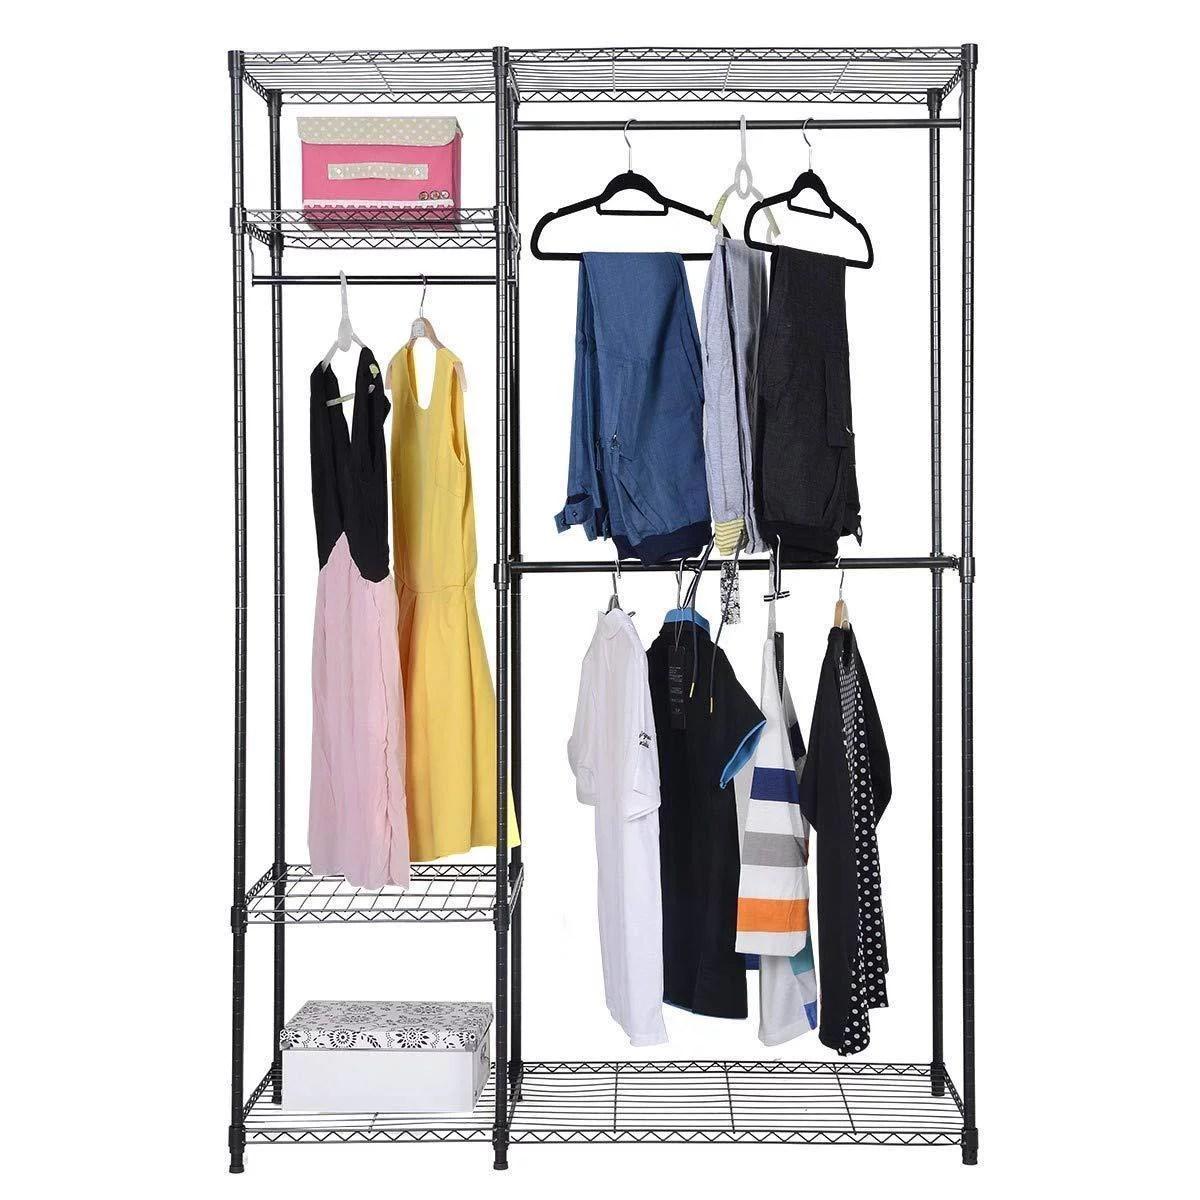 costway 48 x18 x71 closet organizer garment rack portable clothes hanger home shelf